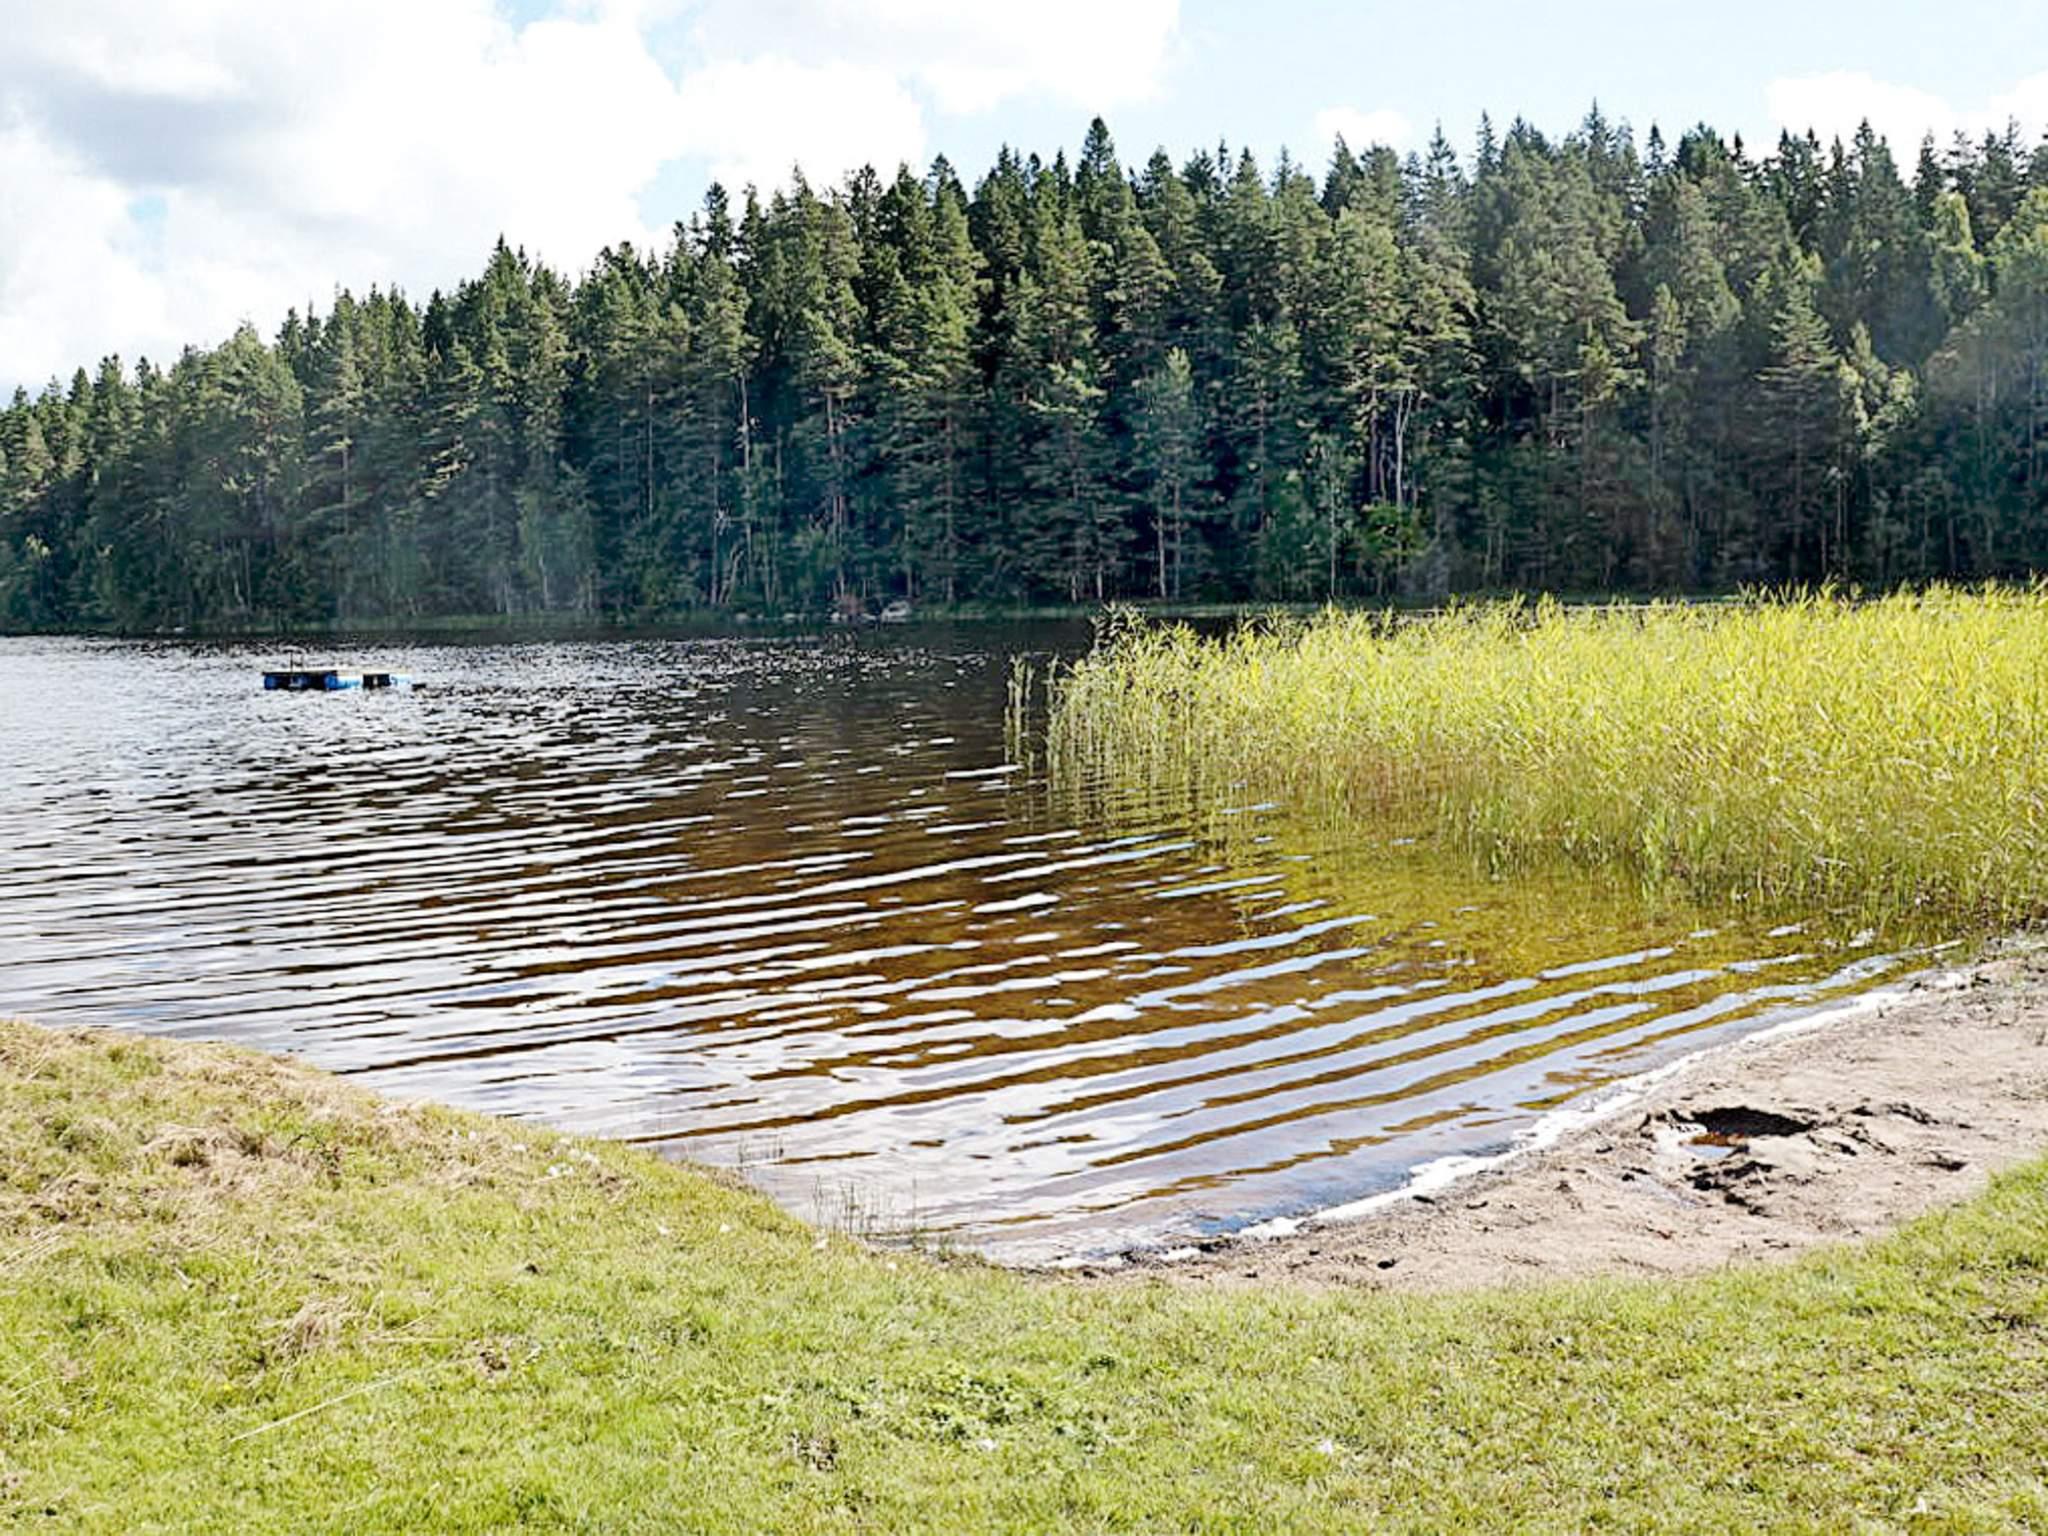 Ferienhaus Motala (921156), Motala, Östergötlands län, Südschweden, Schweden, Bild 15